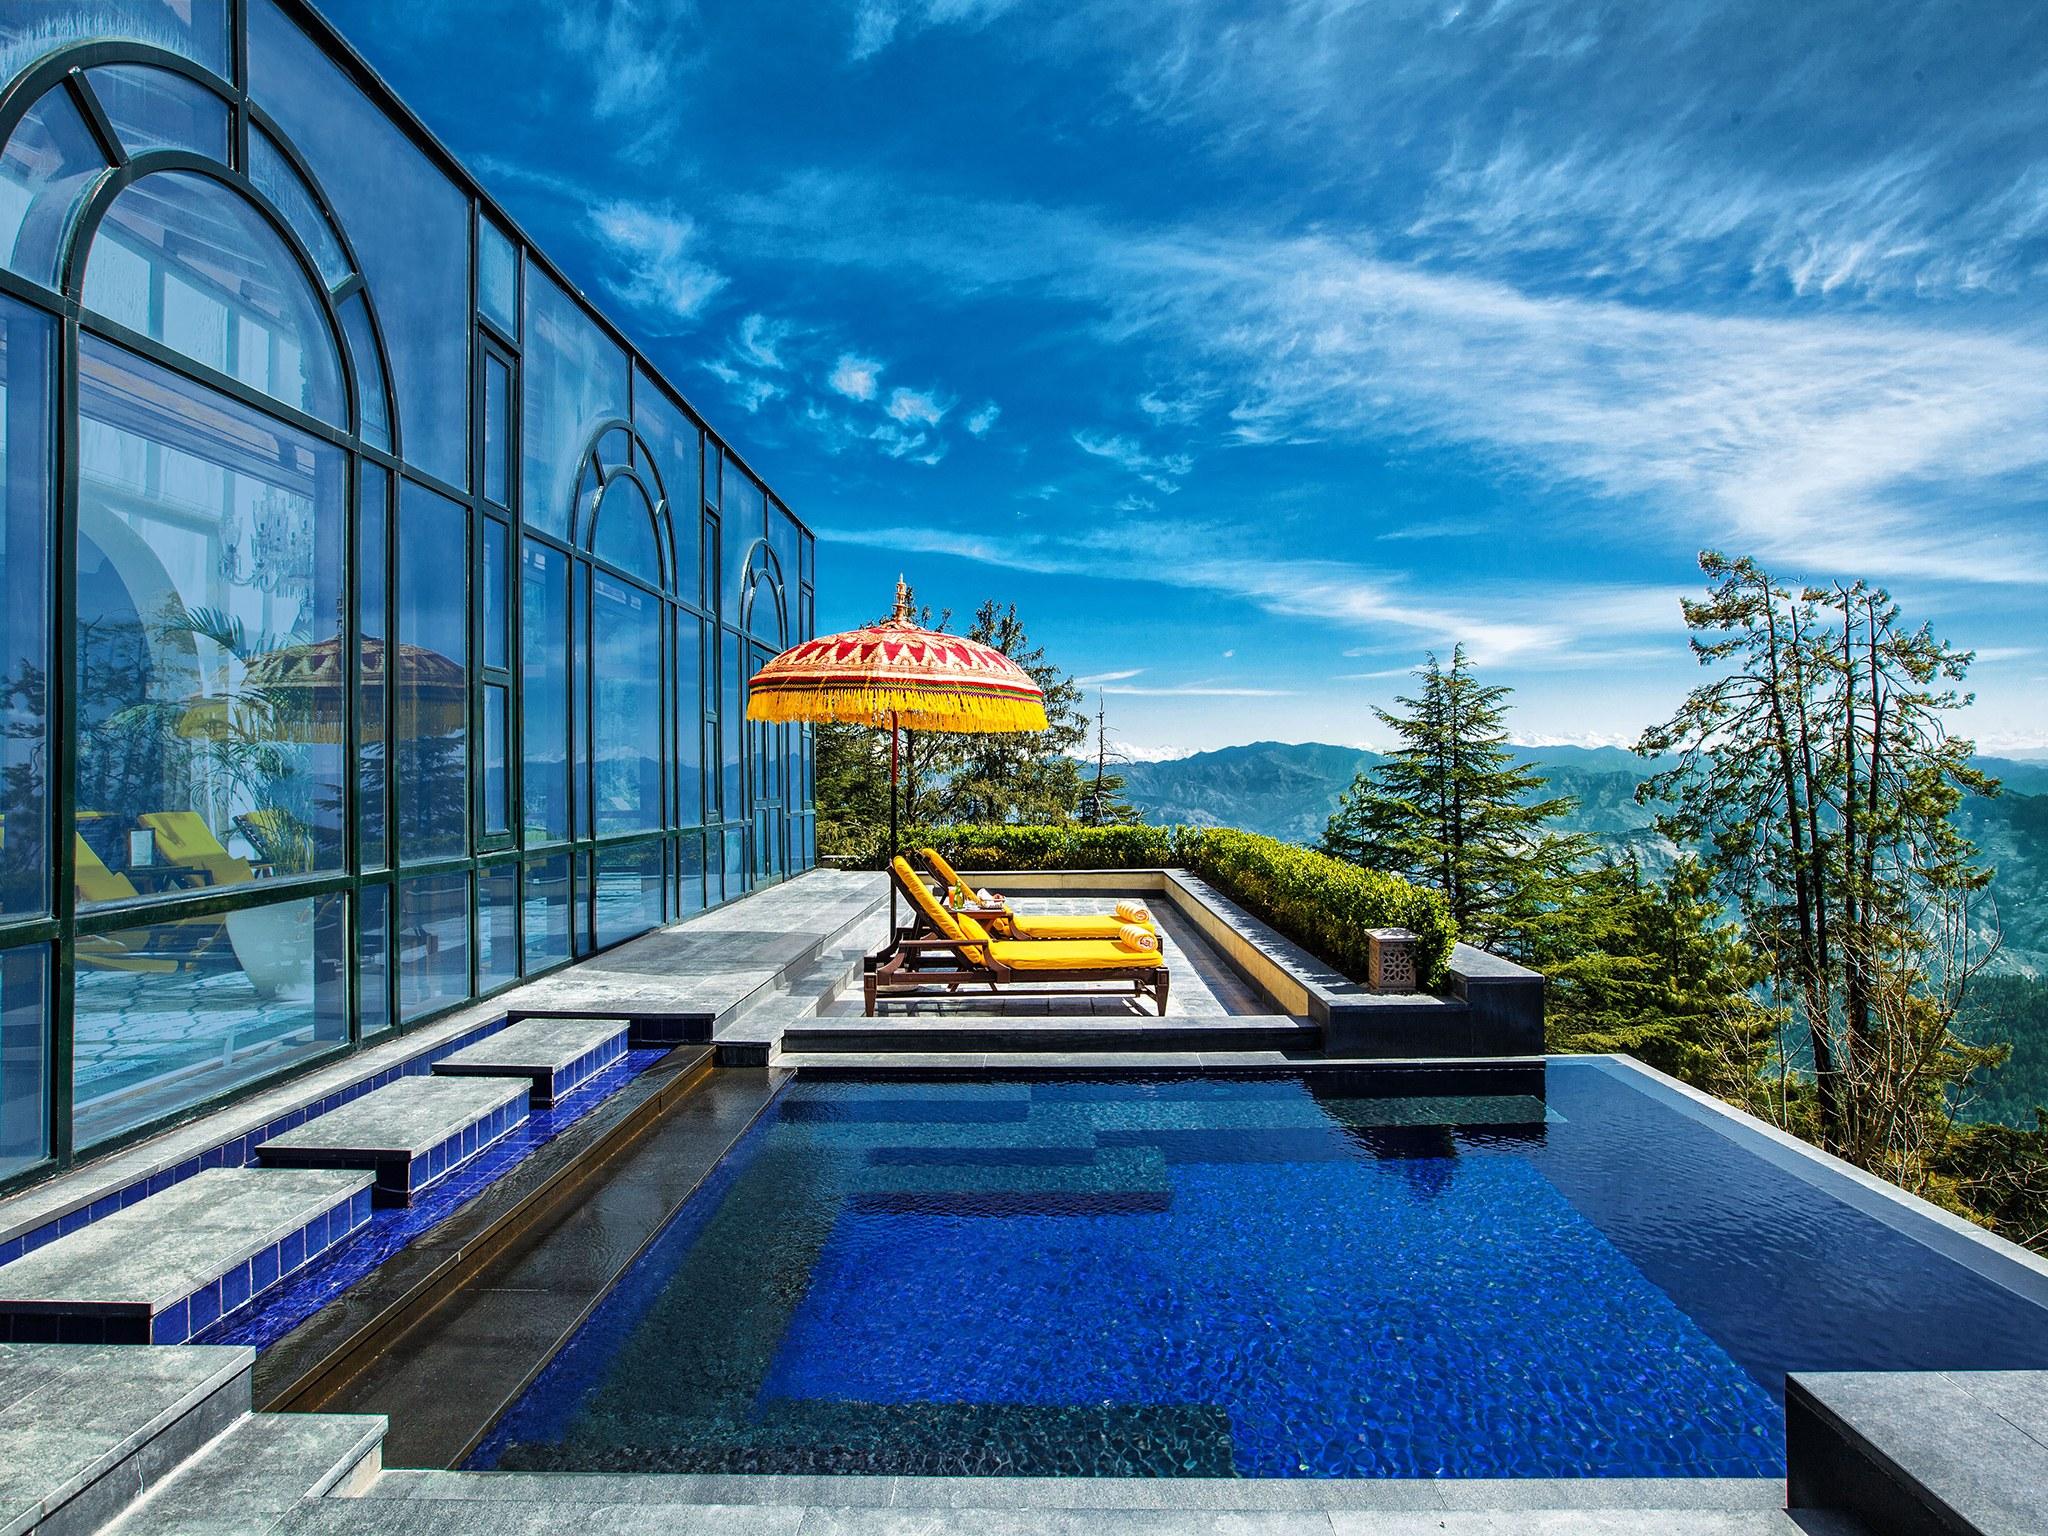 hotel-wildflower-hall-india-recomendaciones-mejores-hoteles-mundo